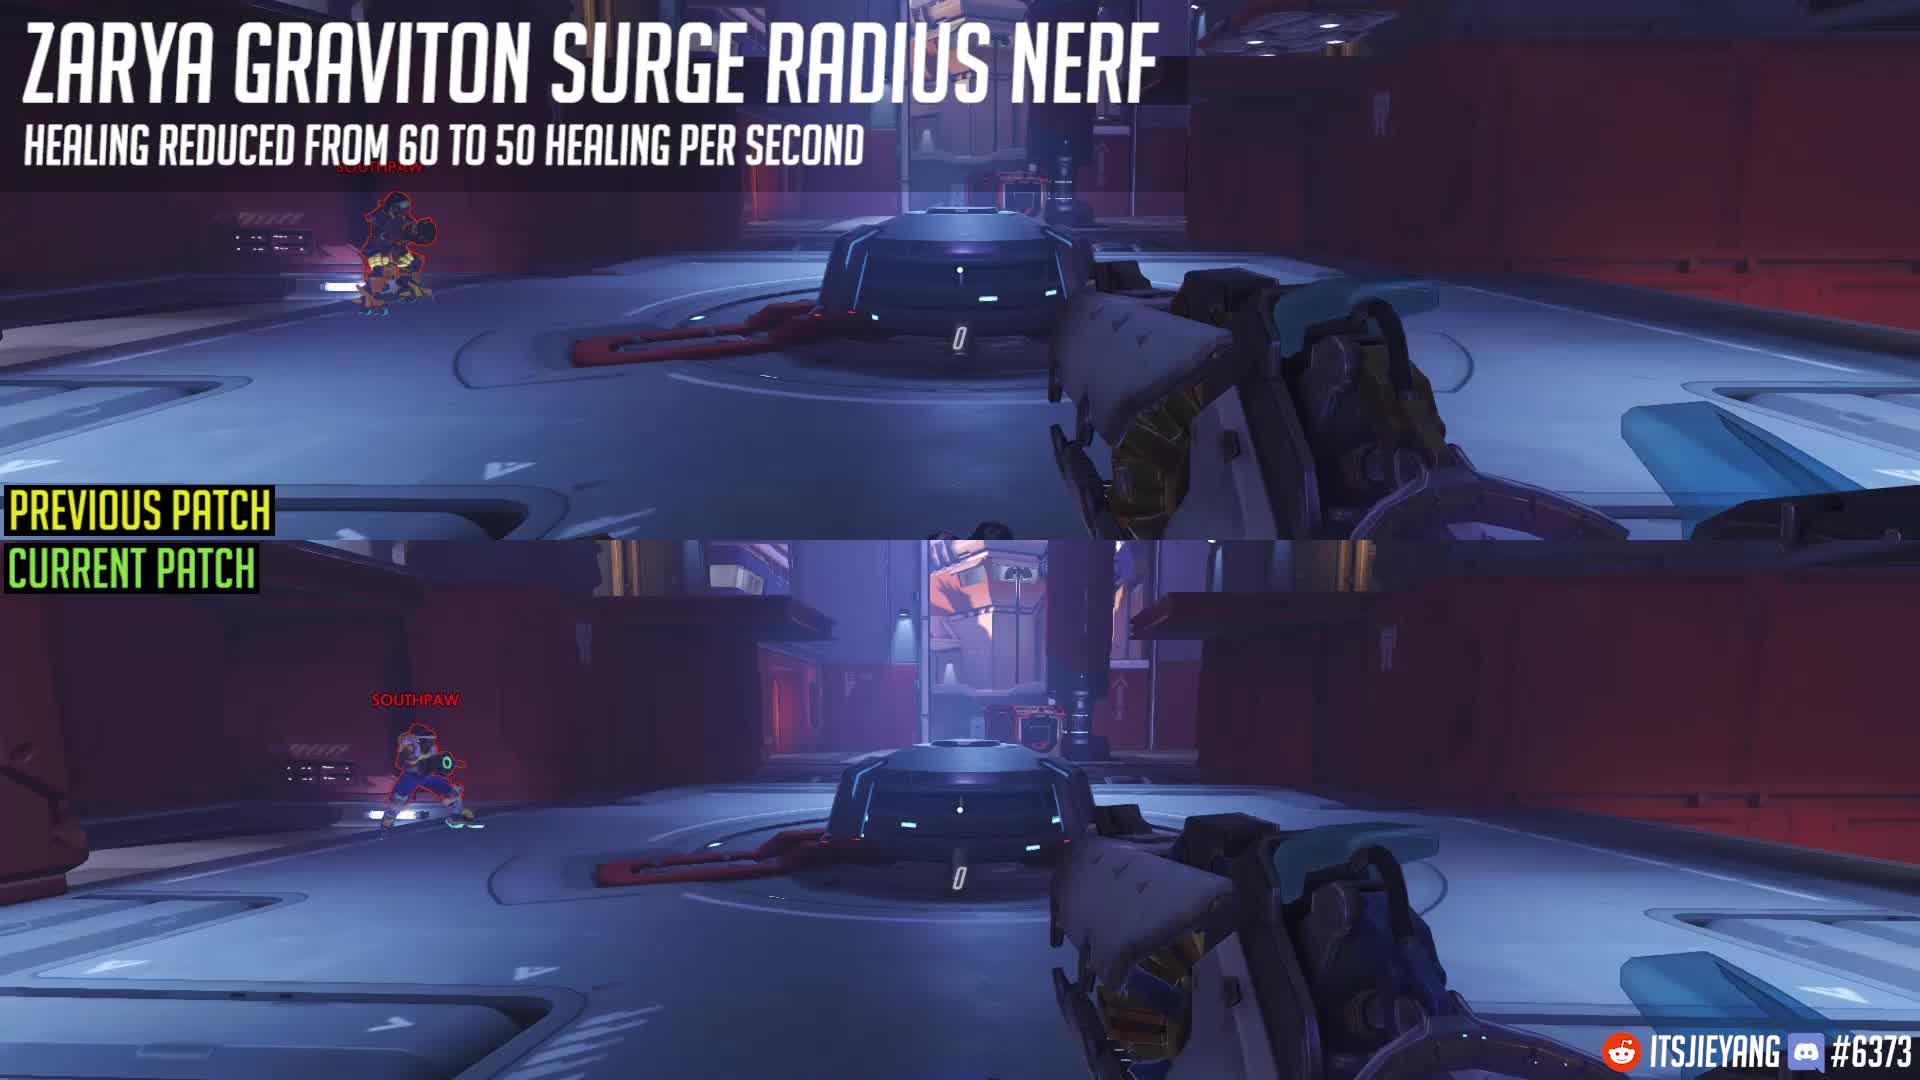 overwatch, zarya, Overwatch Patch 9th August - Zarya Graviton Surge Nerf GIFs